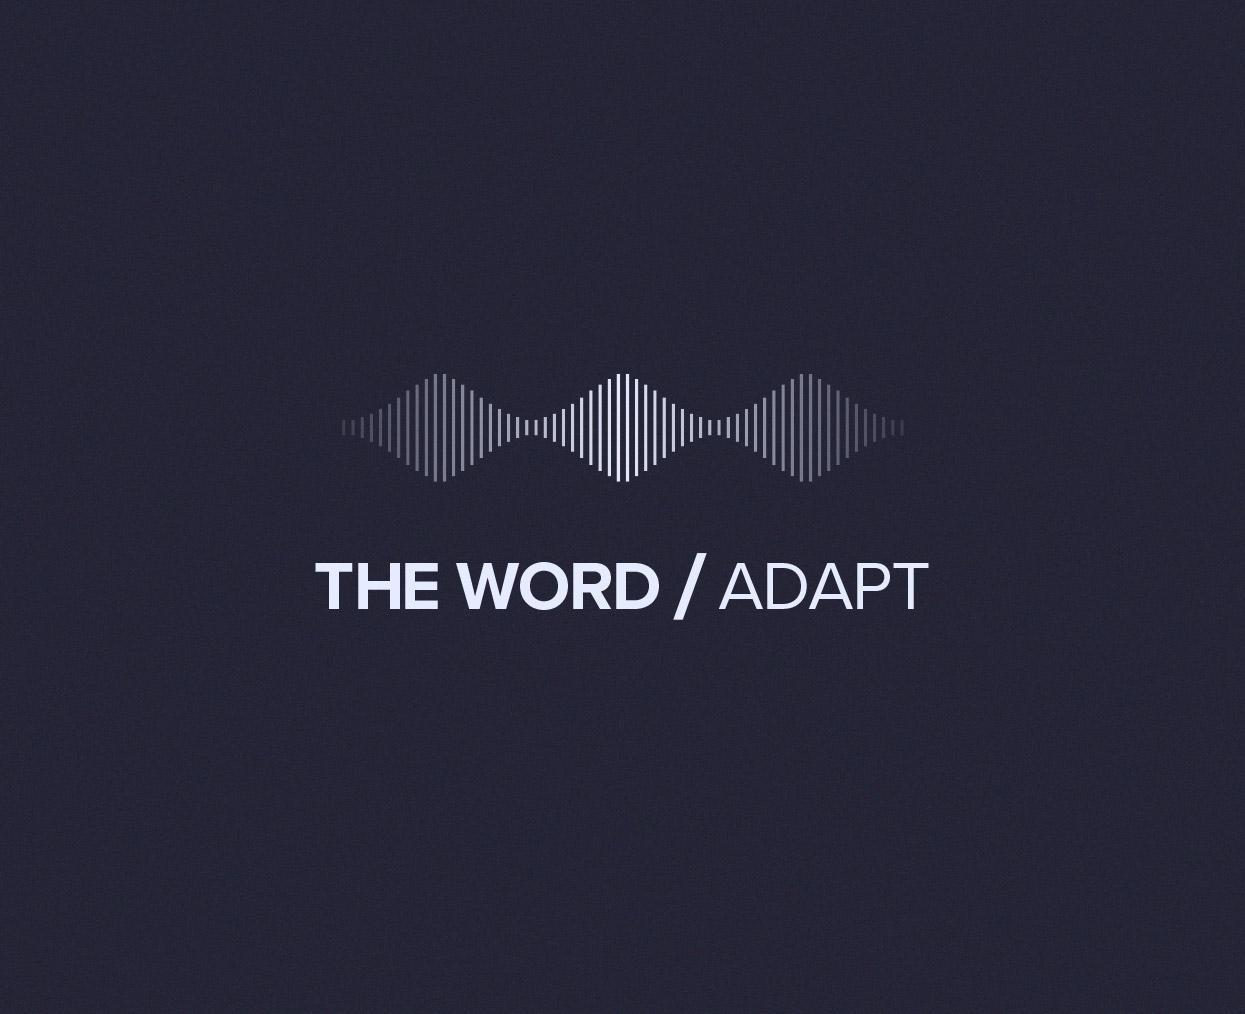 The Word-Adapt_830x66